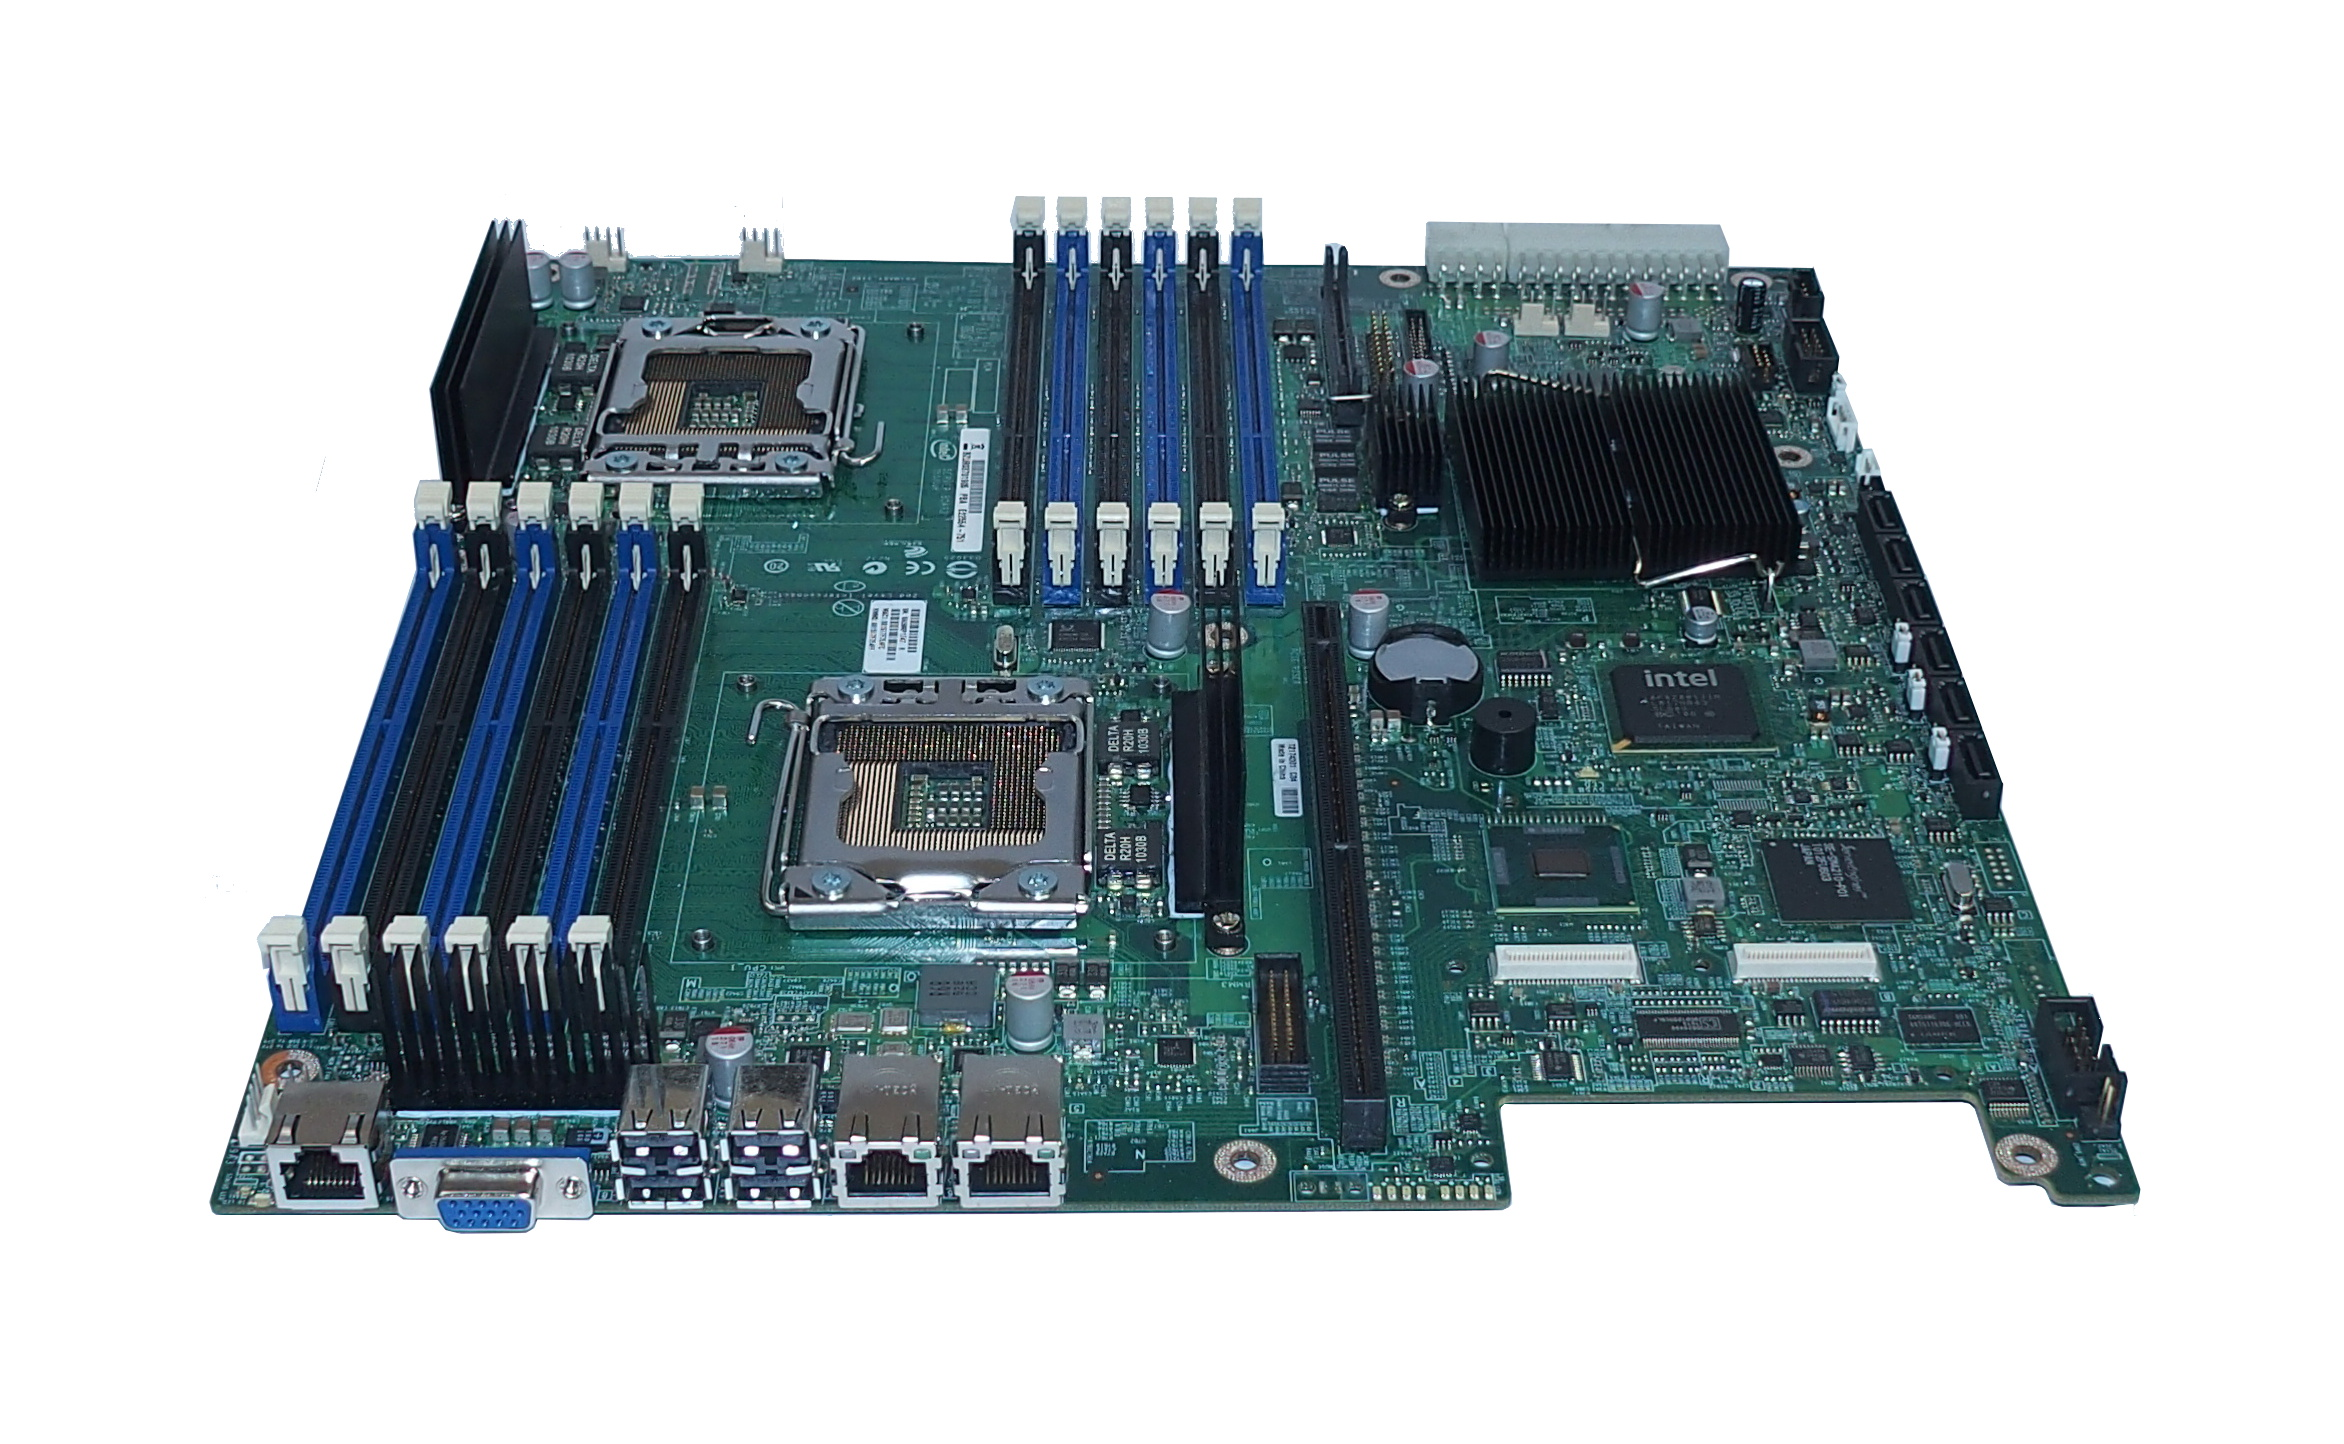 Intel E22554-604 S5520UR Dual Socket LGA1366 Server Board